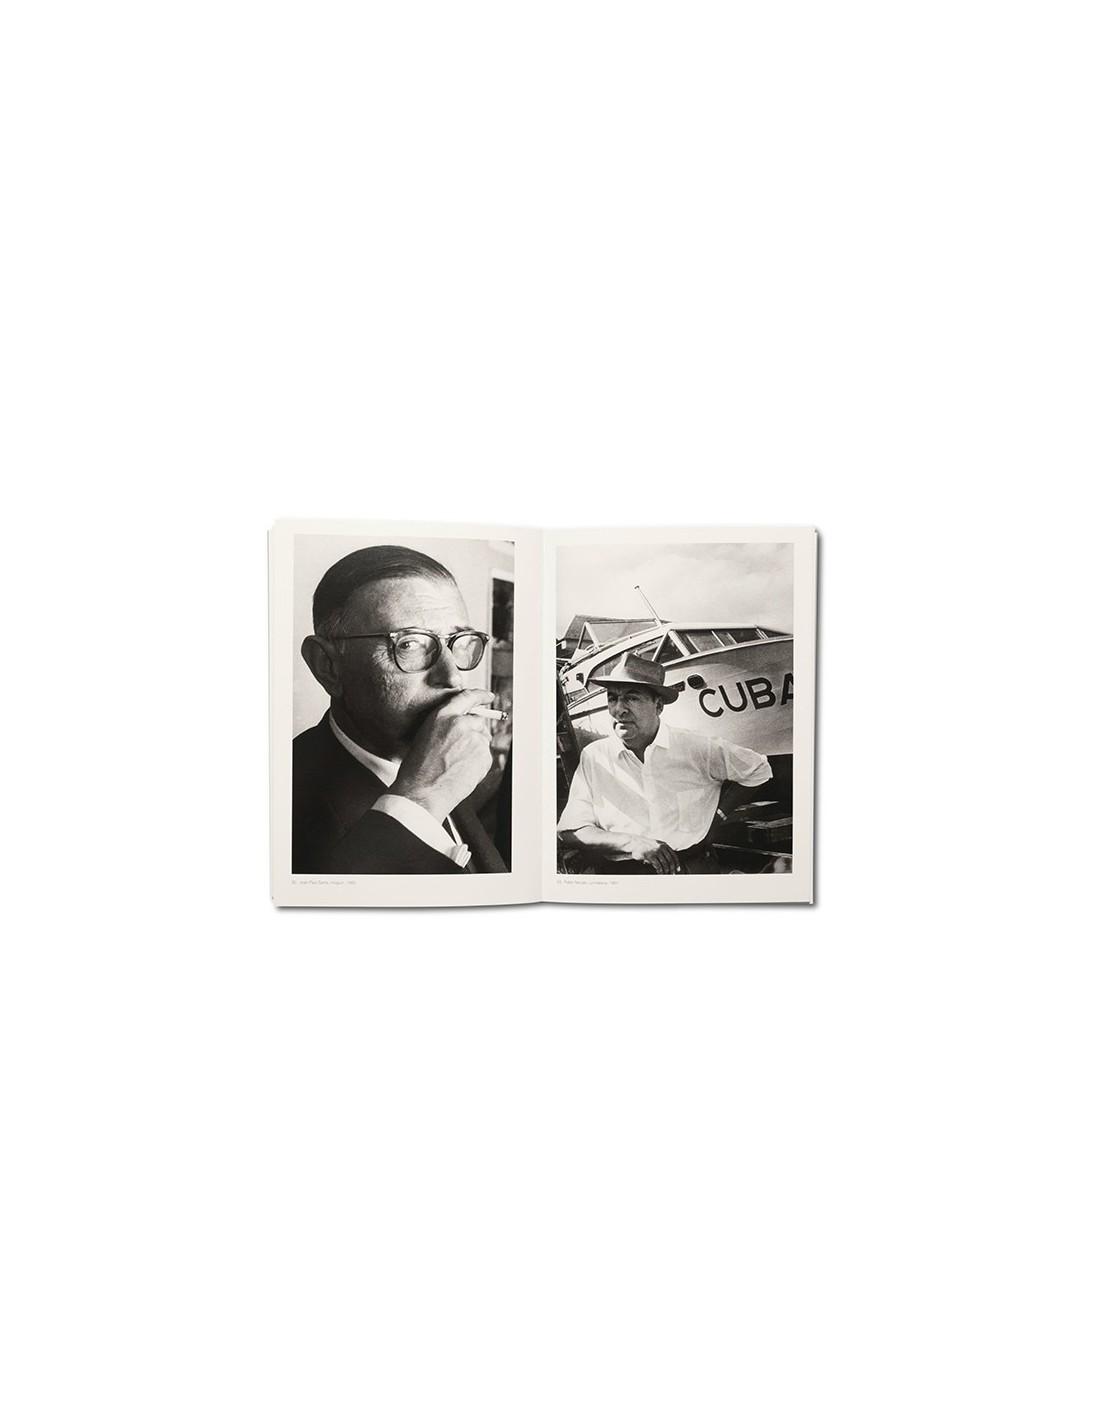 Alberto Korda : A Revolutionary Lens by Mark Sanders (2007, Hardcover) art book